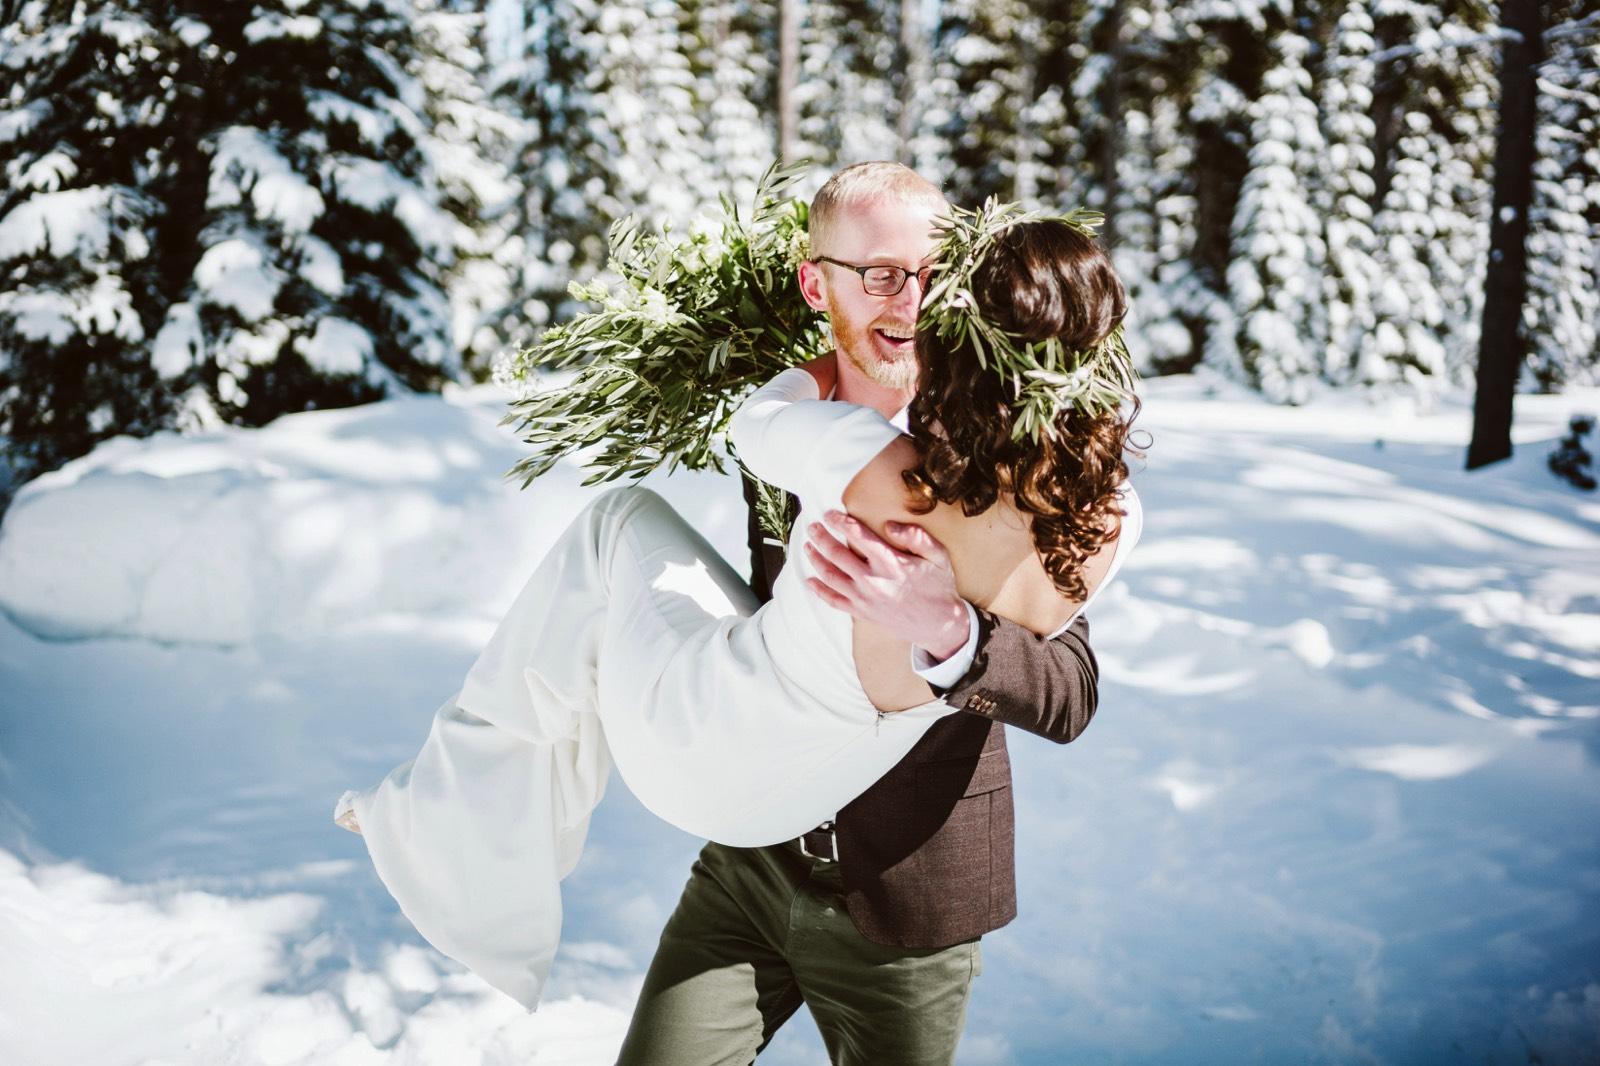 alpine-lakes-high-camp-winter-wedding-20 ALPINE LAKES HIGH CAMP WEDDING